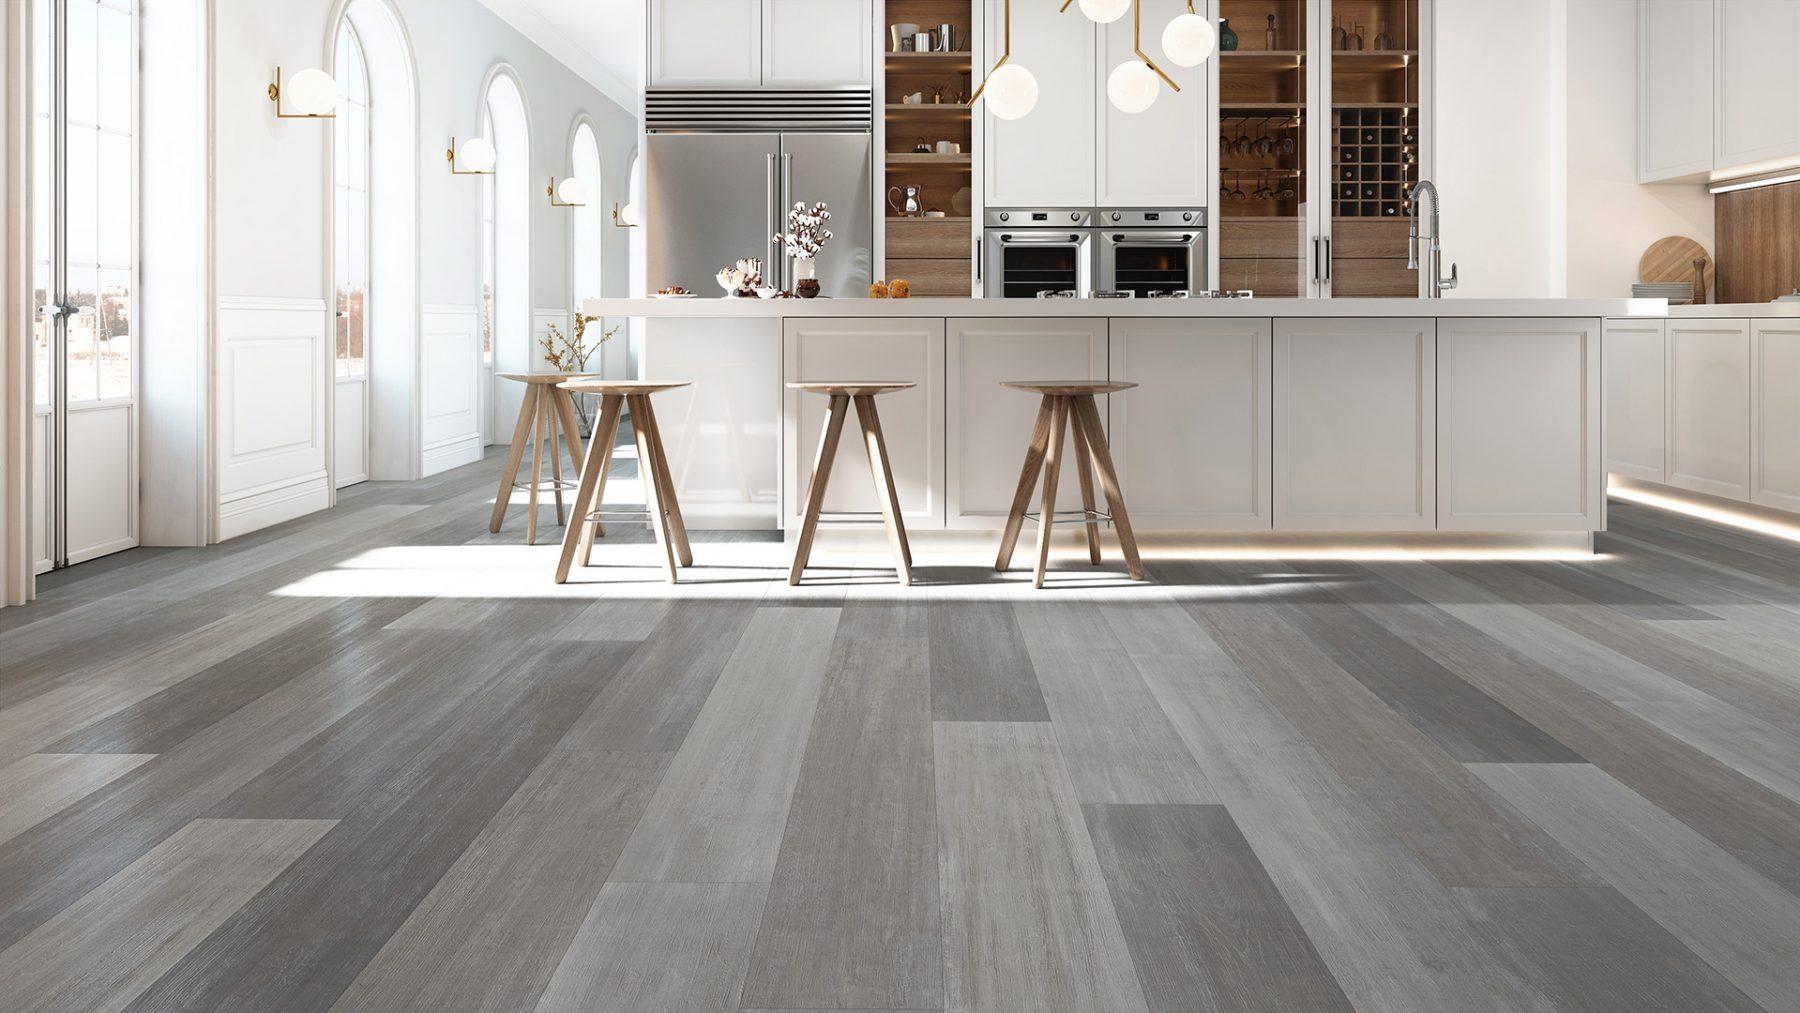 vray 3dsmax render kitchen beautiful light